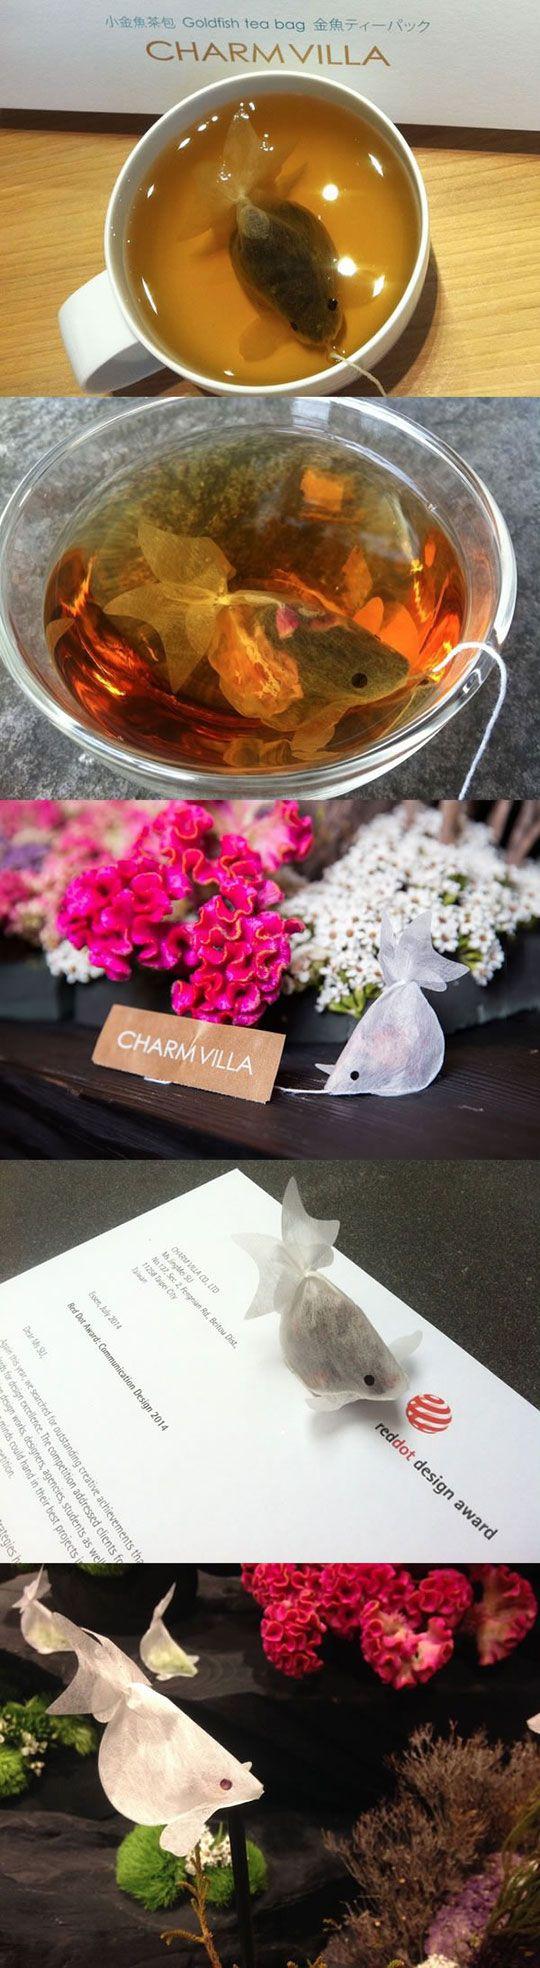 Tea Bags That Look Like Goldfish